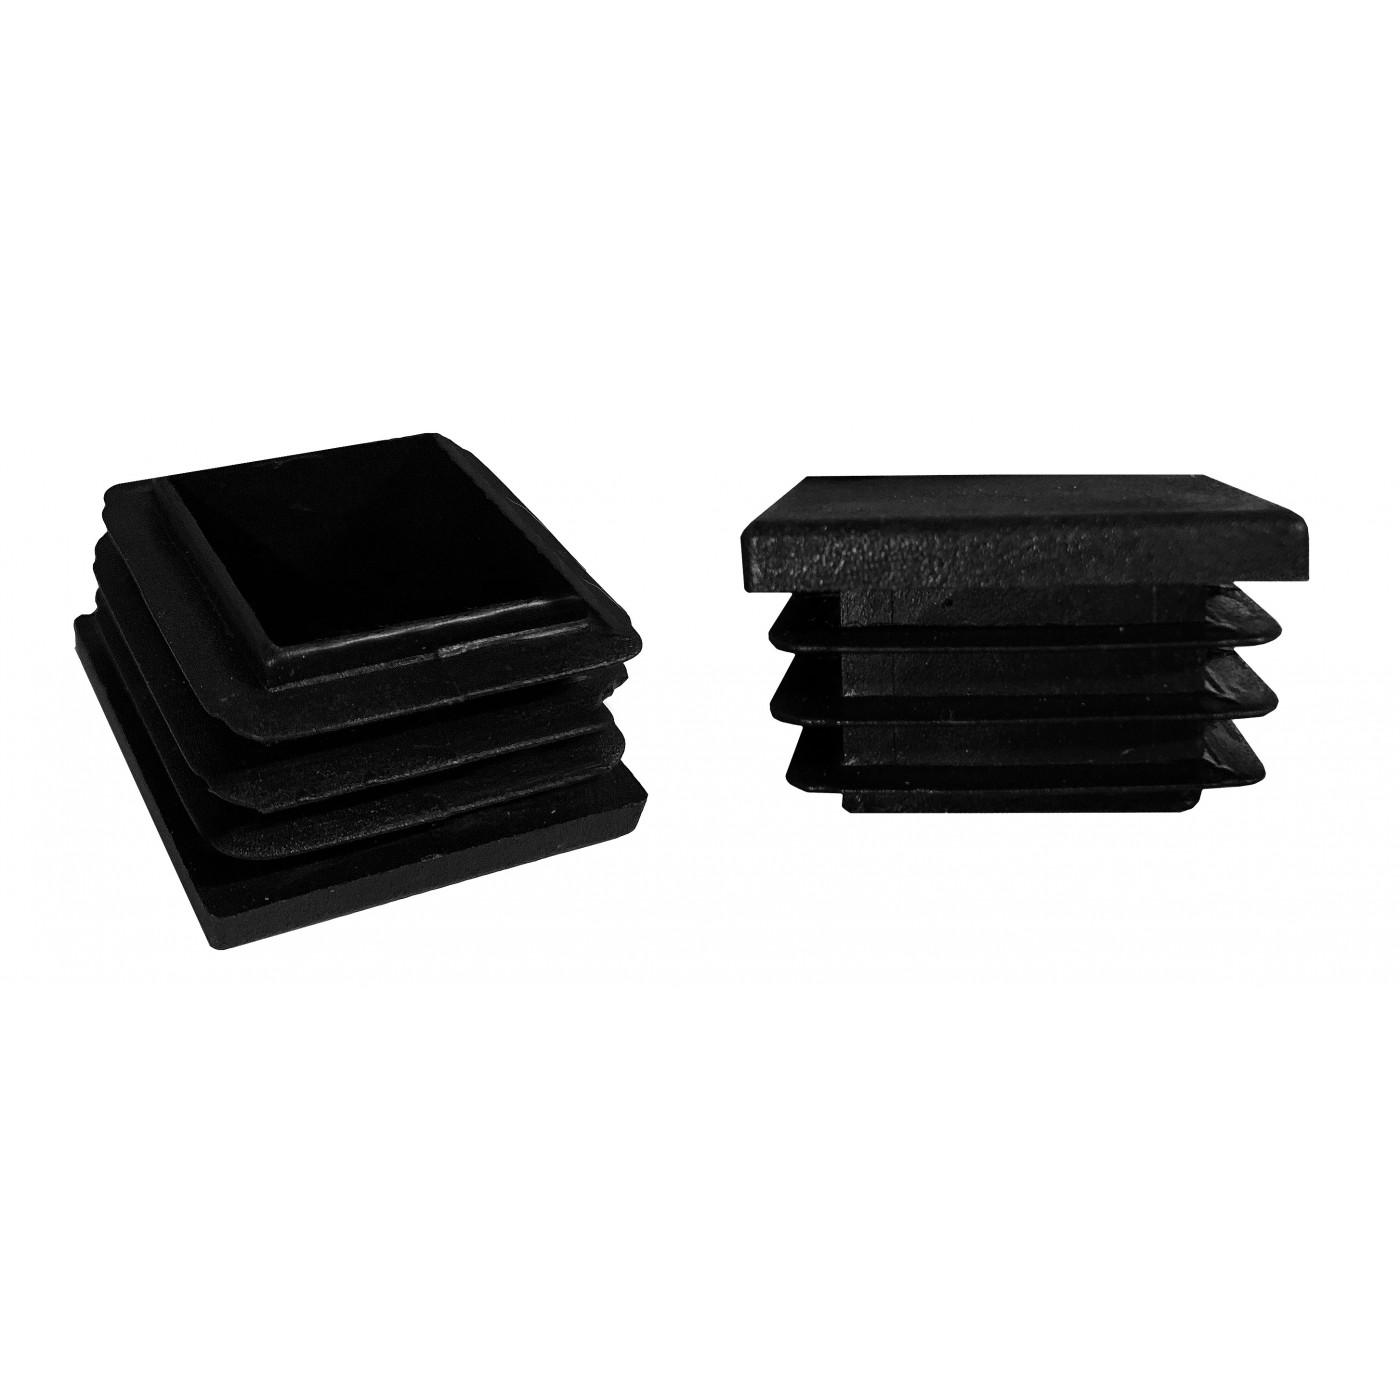 Set of 24 chair leg caps (F37/E43/D45, black)  - 1